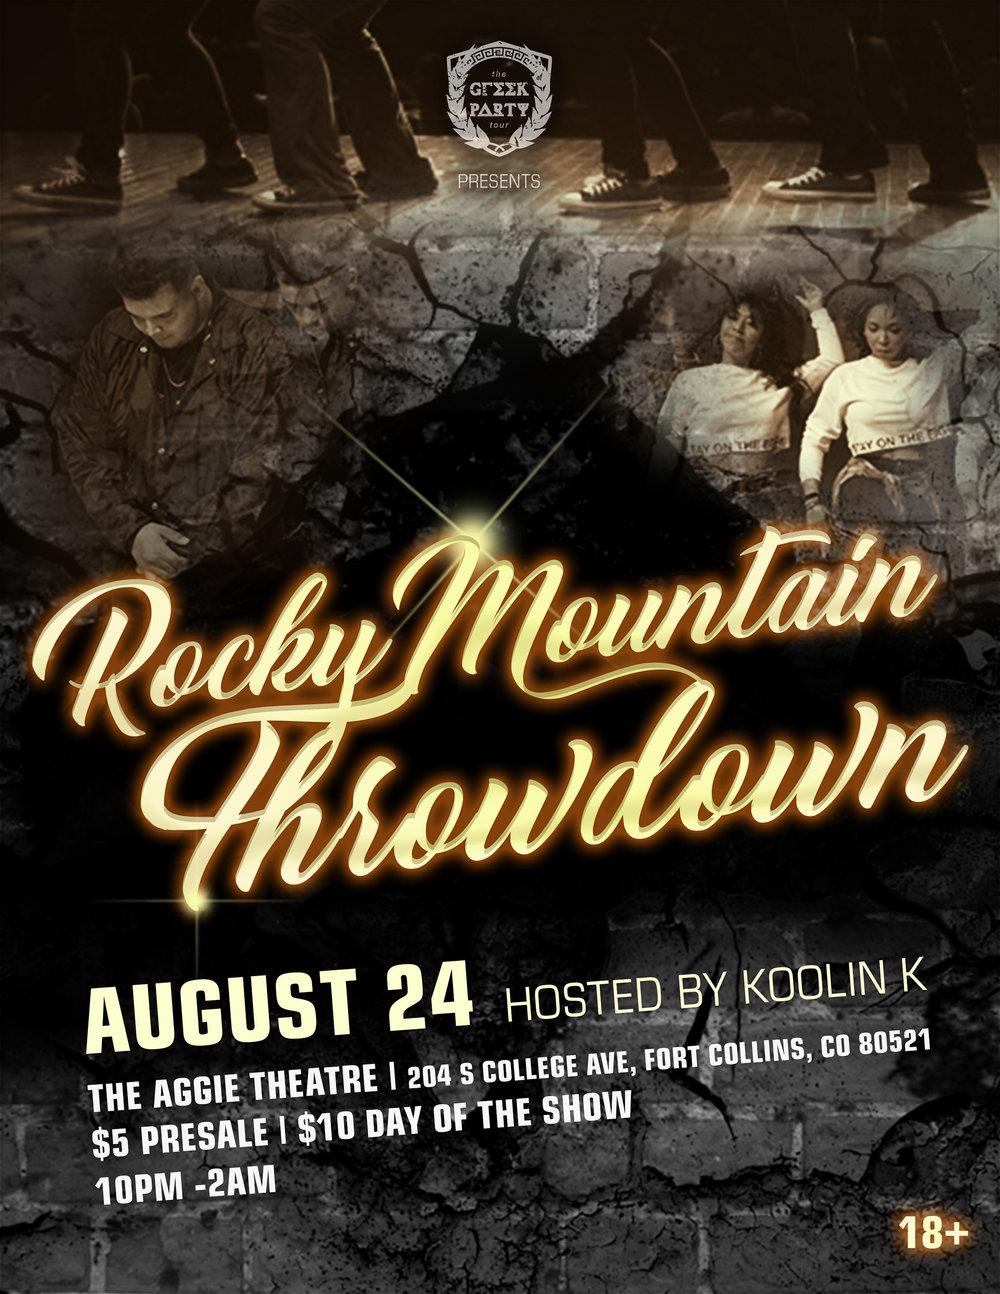 Rocky-Mountain-Throwdown-Flyer.jpg